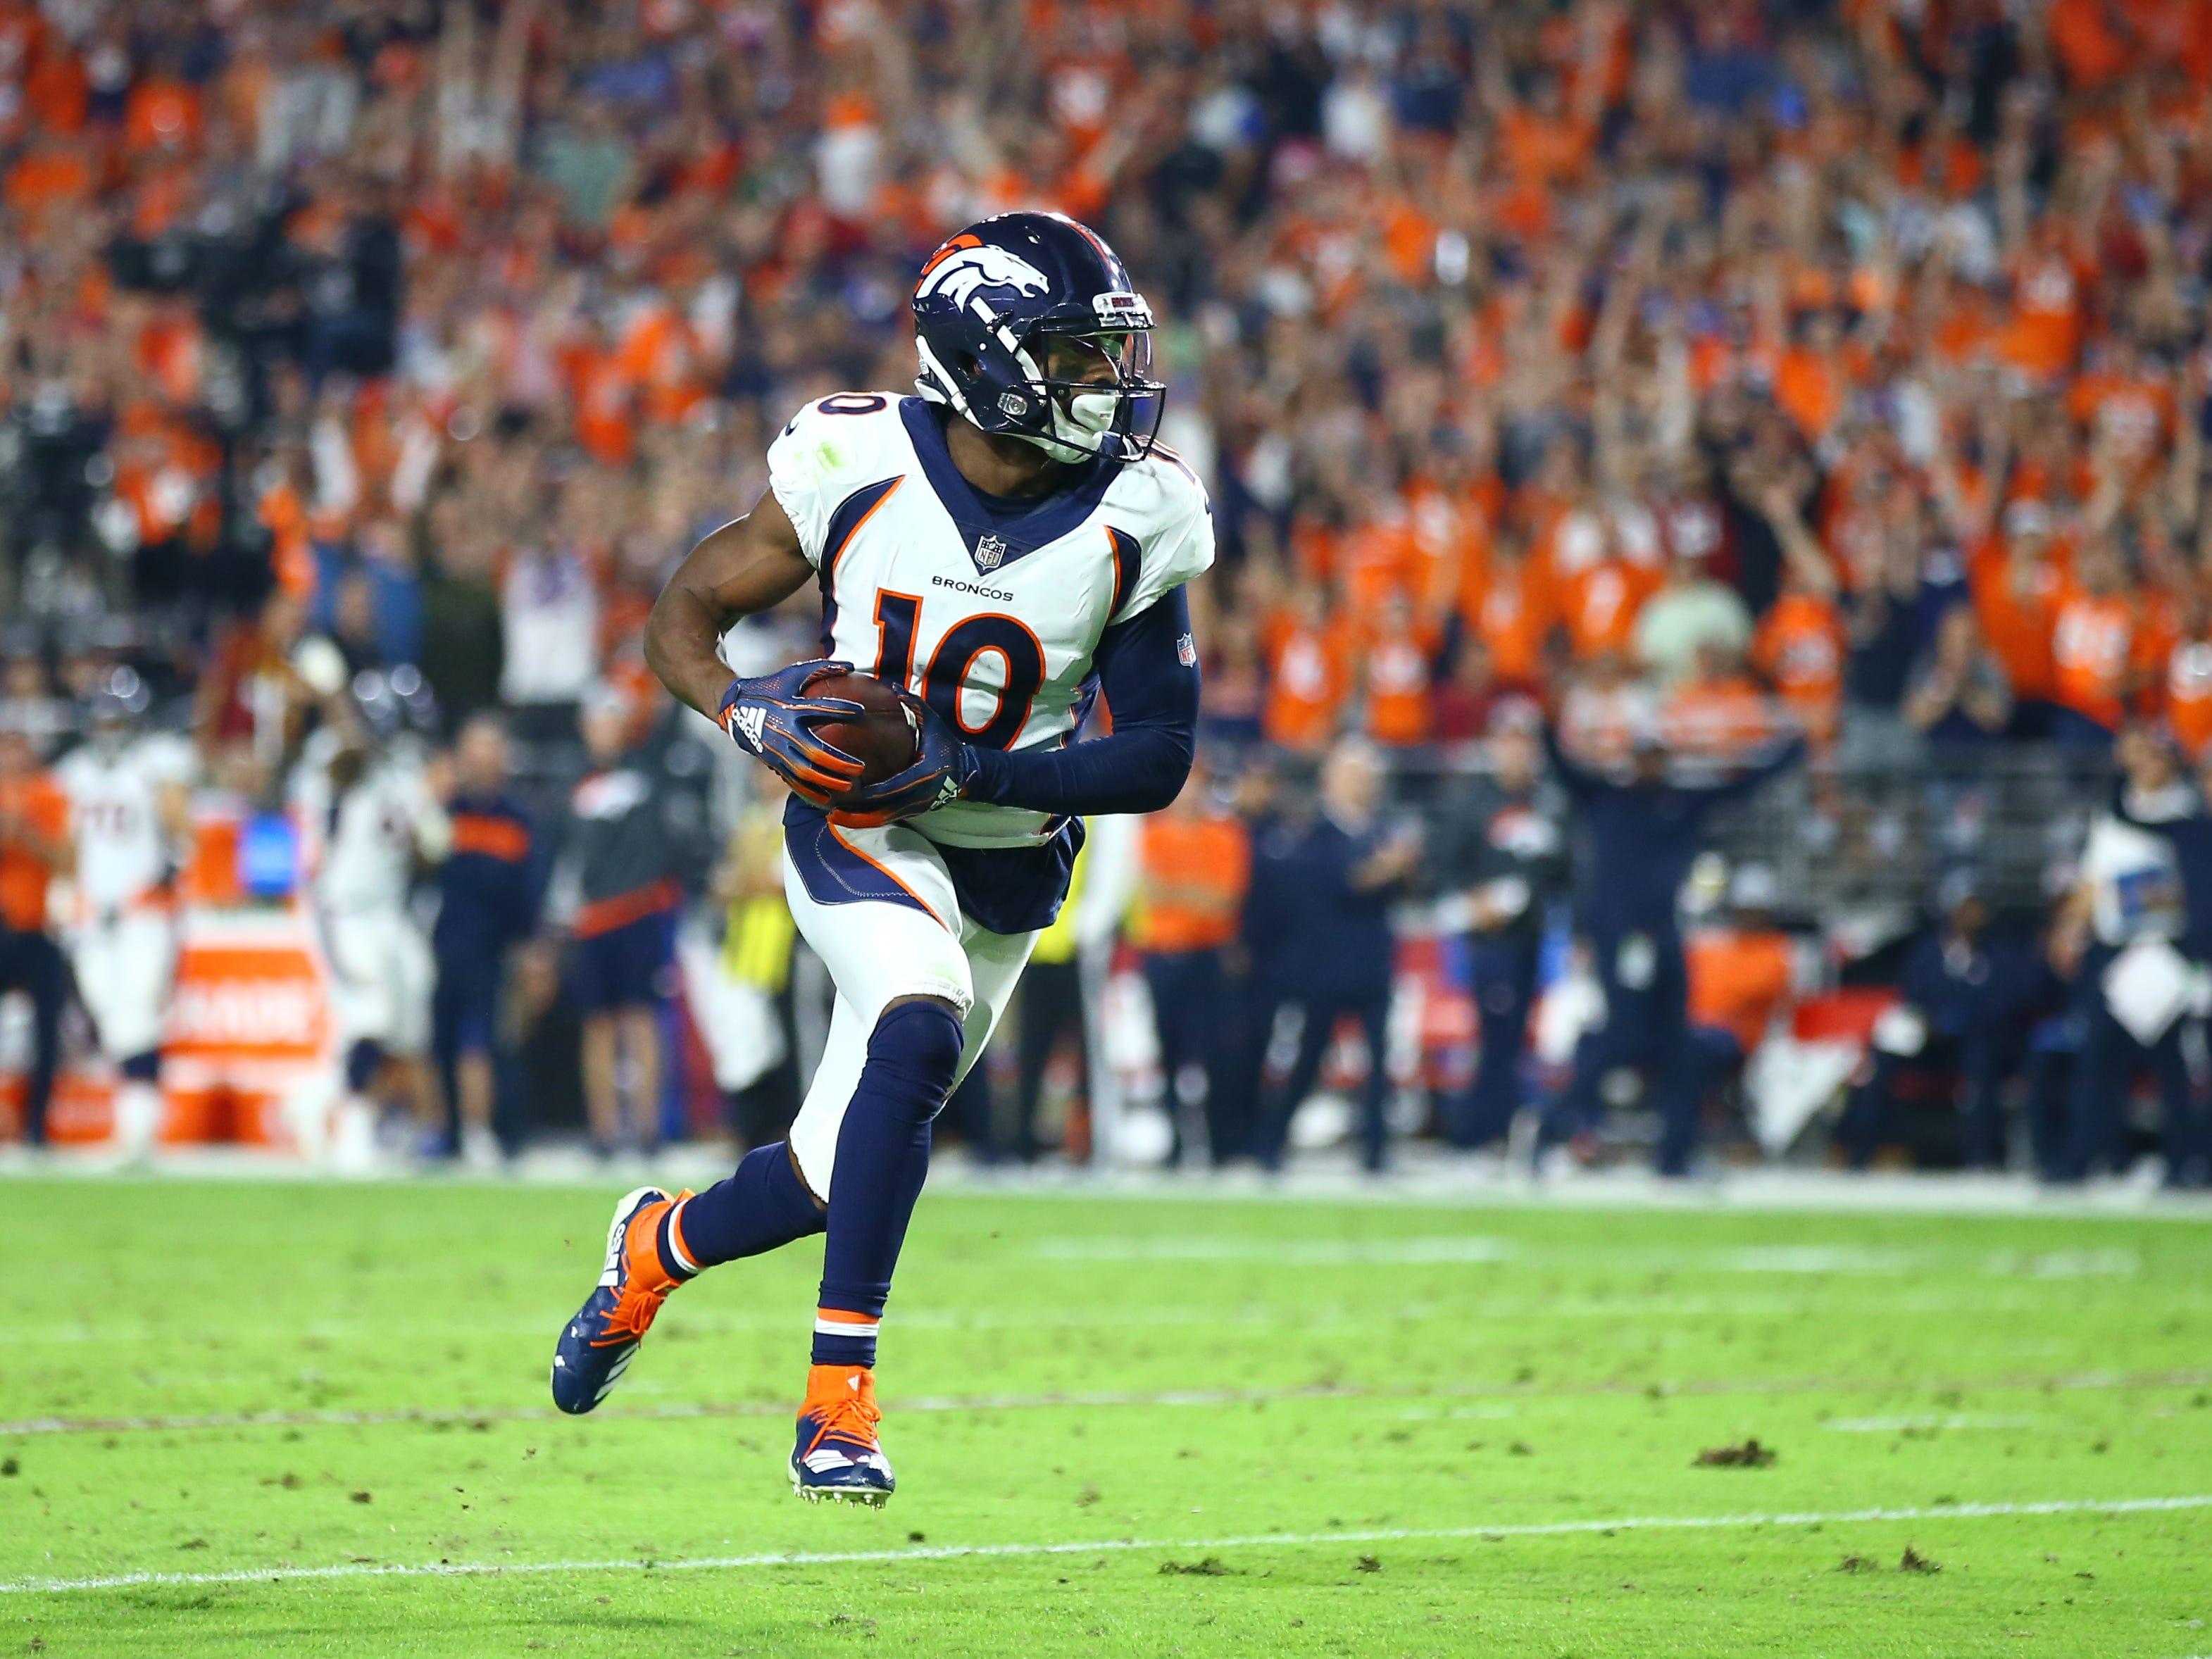 Emmanuel Sanders, WR, Denver Broncos (torn Achilles, out for season)